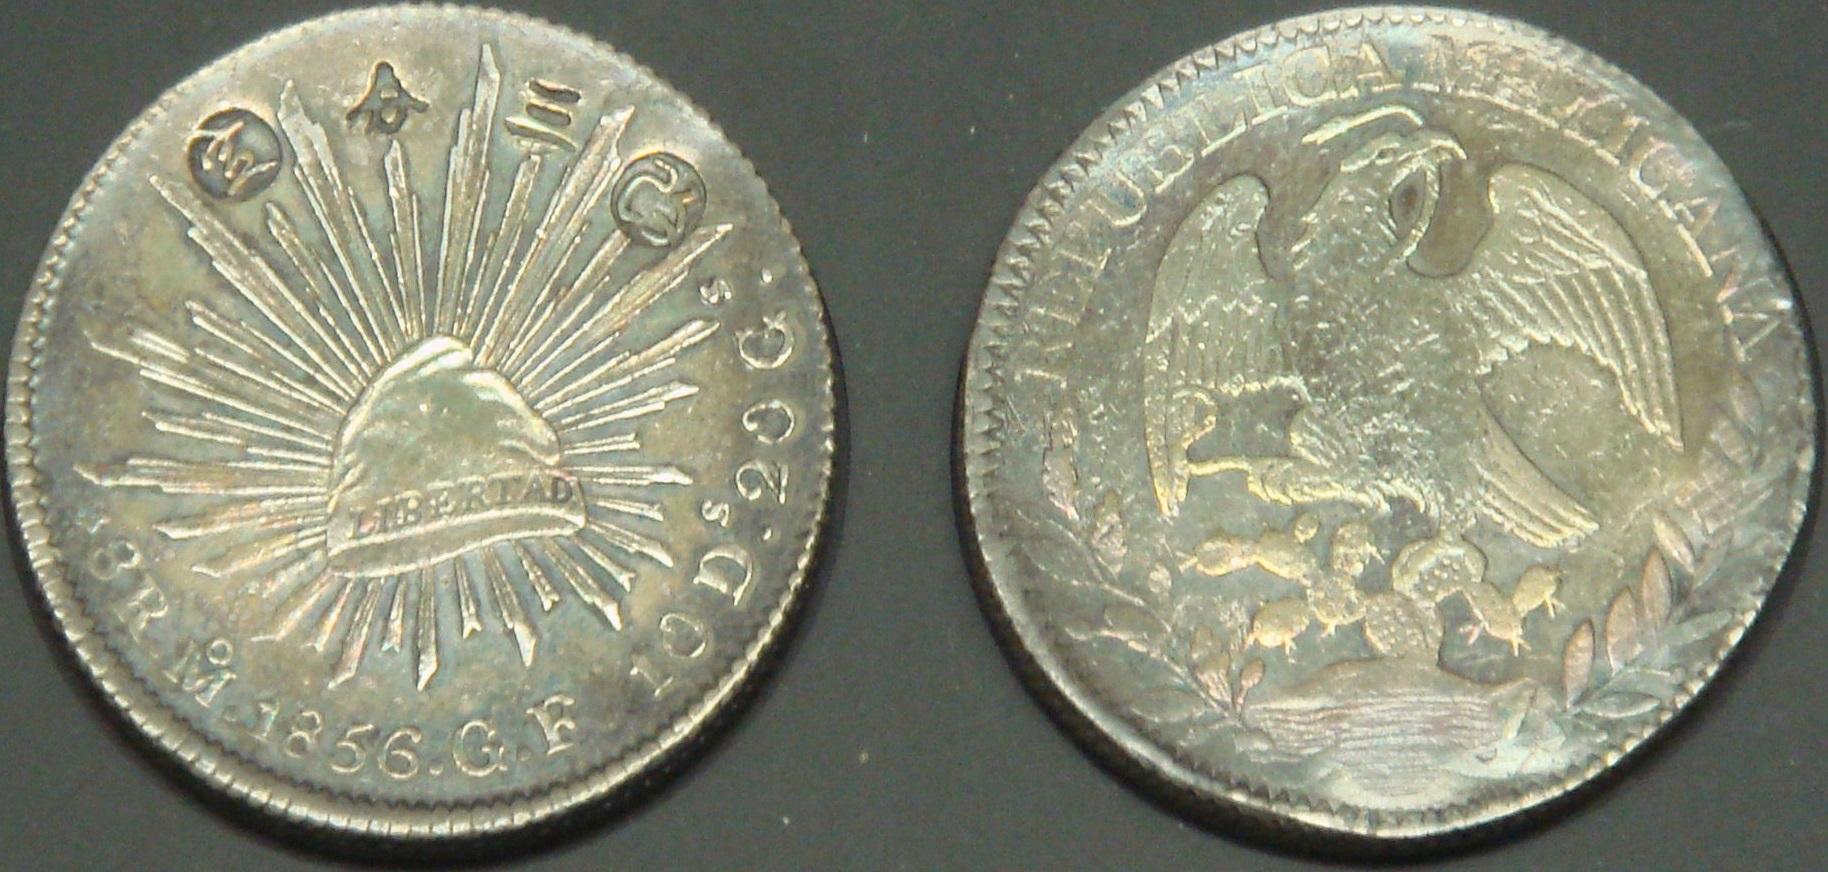 Mexican Peso Coins Silver Values